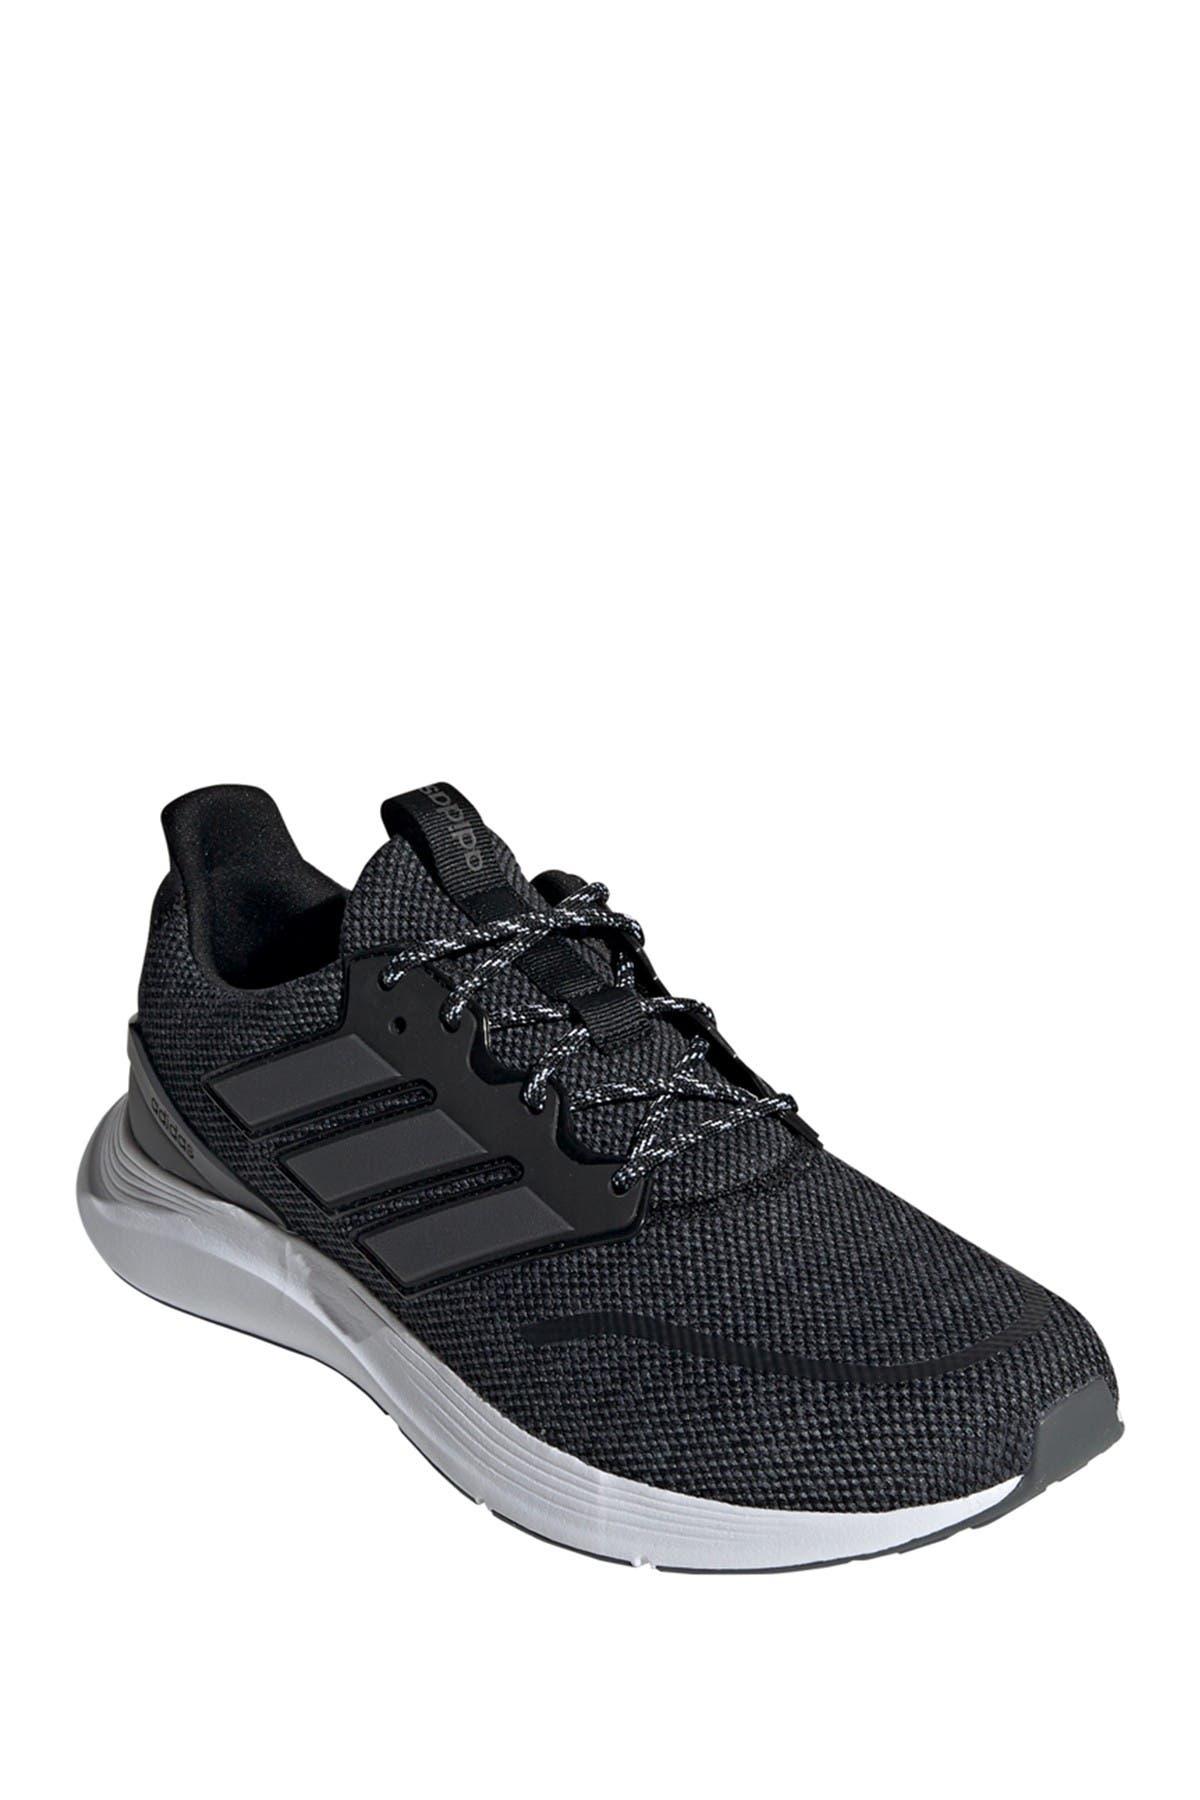 adidas | Energy Falcon Running Shoe